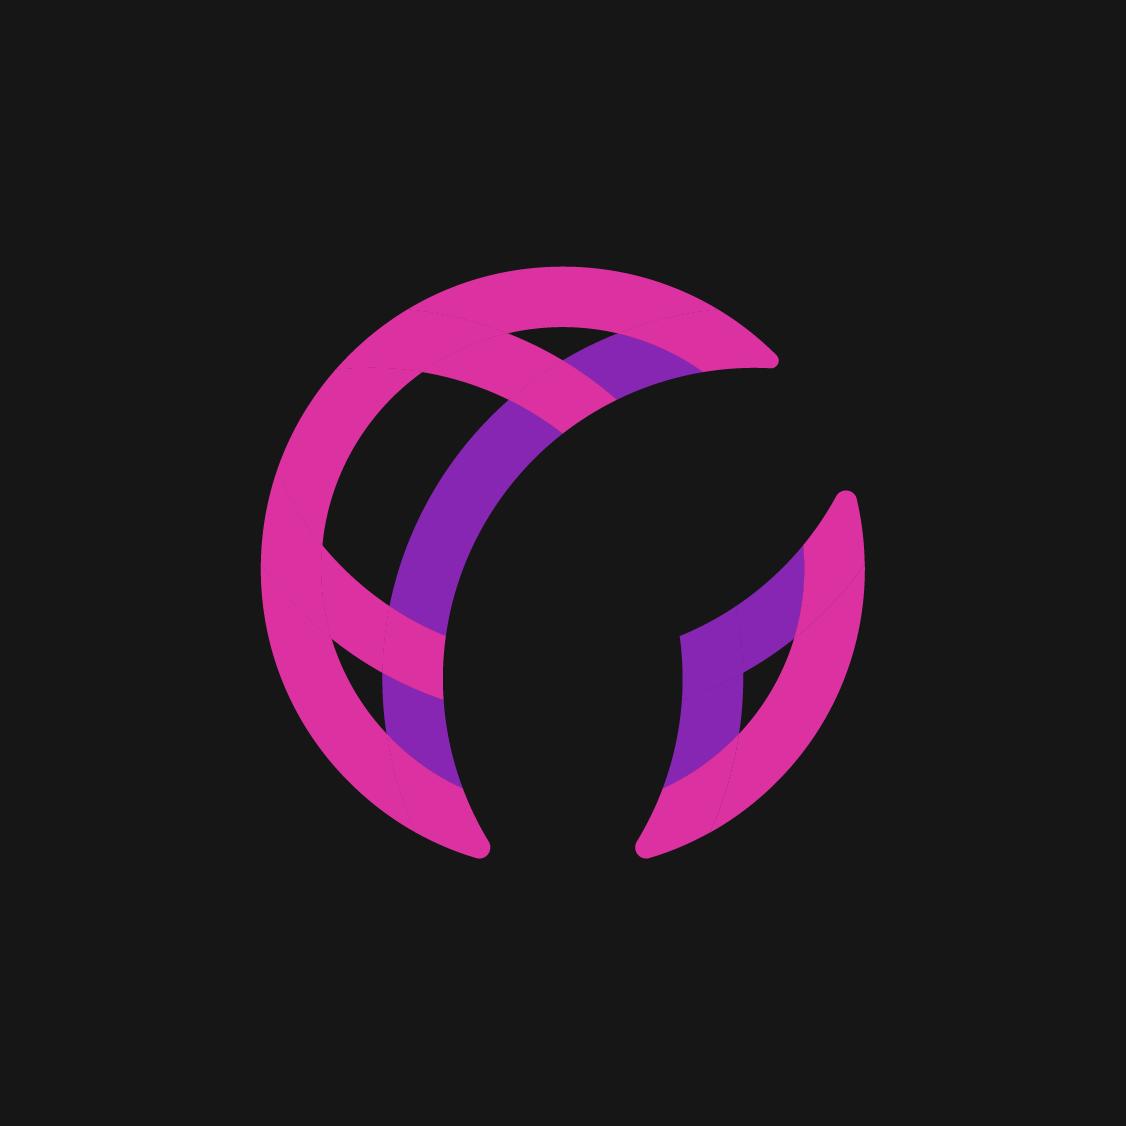 all-logos-2020_80-80